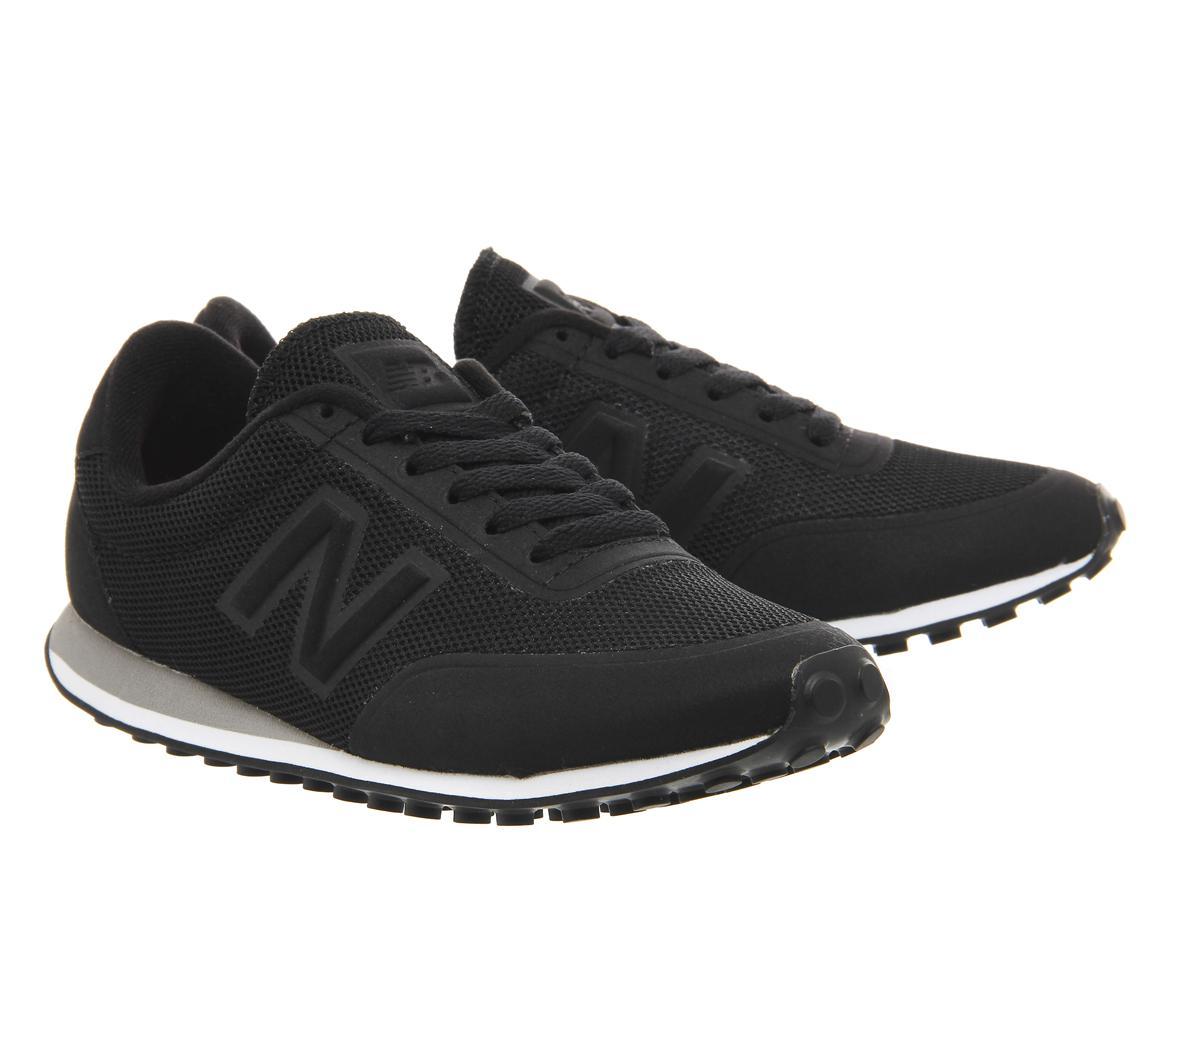 Lyst - New Balance 410 in Black for Men